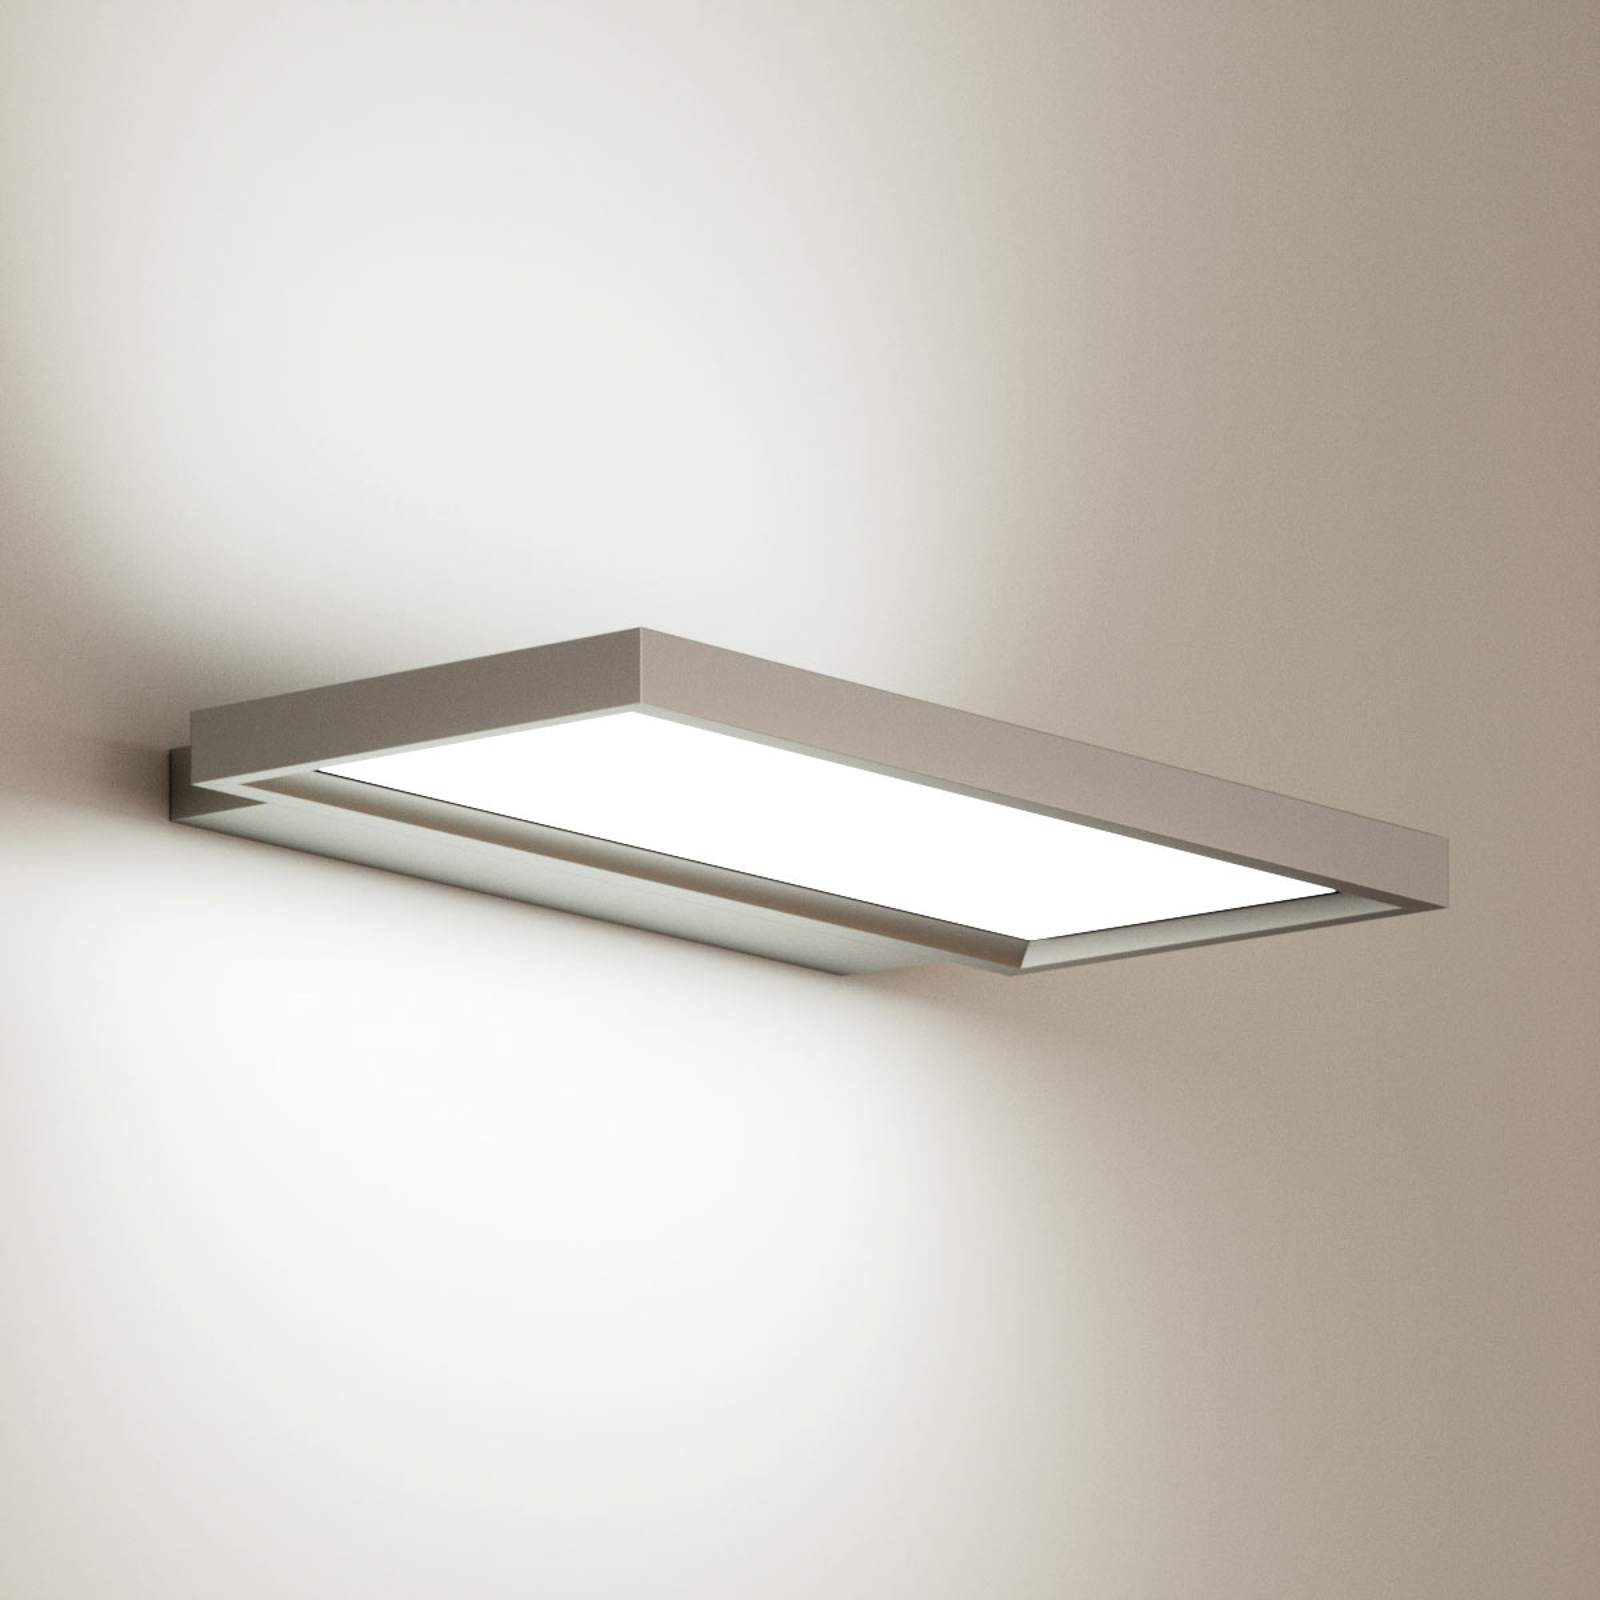 LED-Wandleuchte Rick fürs Büro, universalweiß